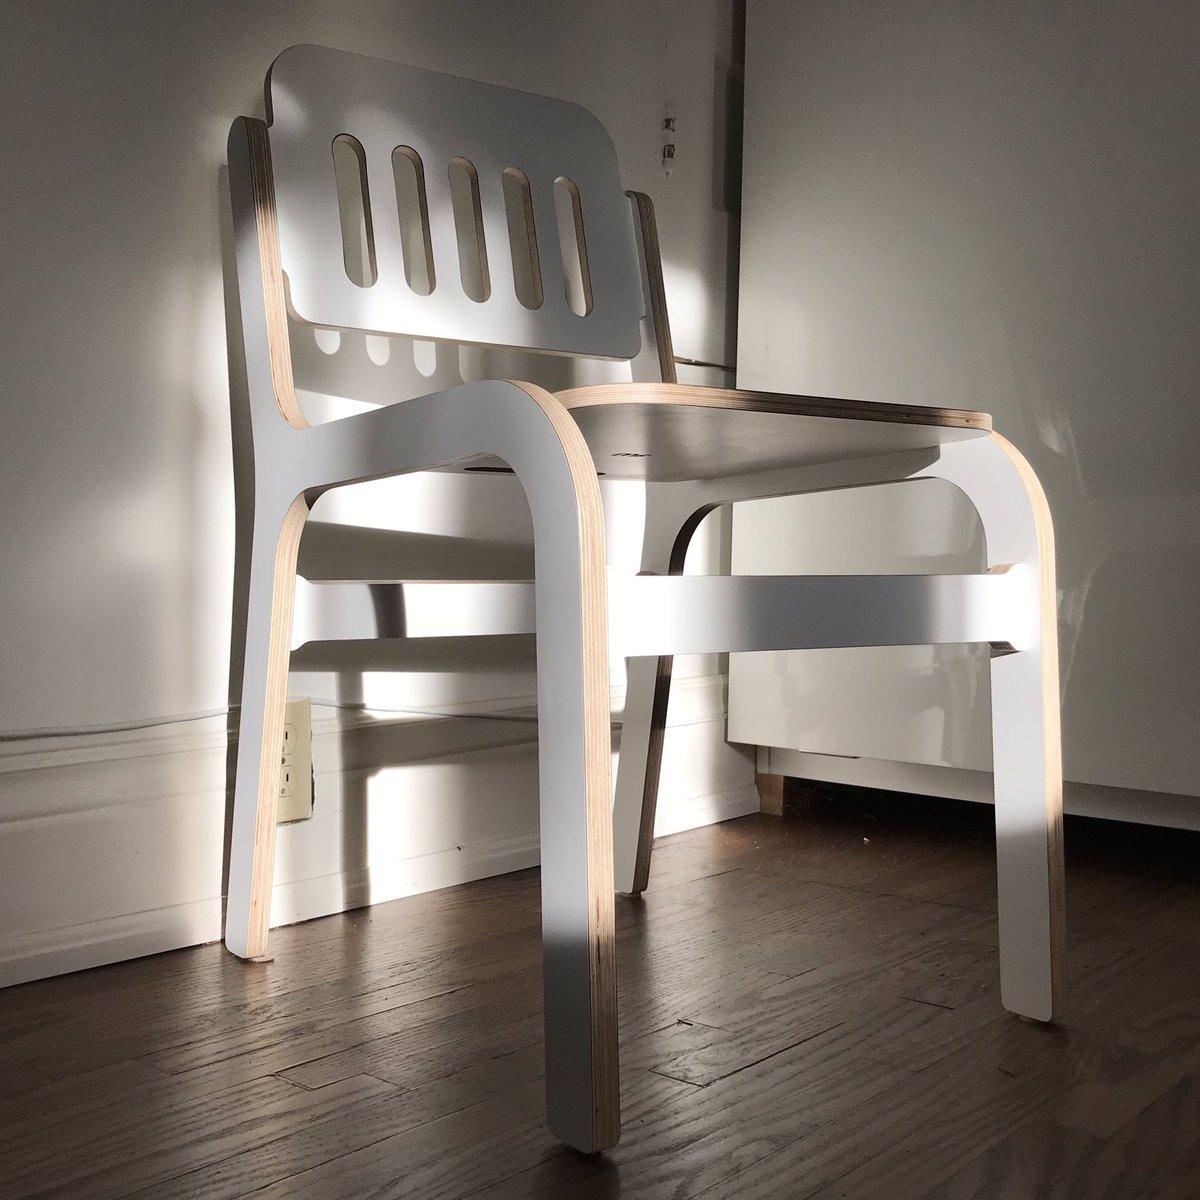 Scandinavian modern look chairs nashville design by taavitamtik furniture modulefurniture mf stool chair table desk design art home